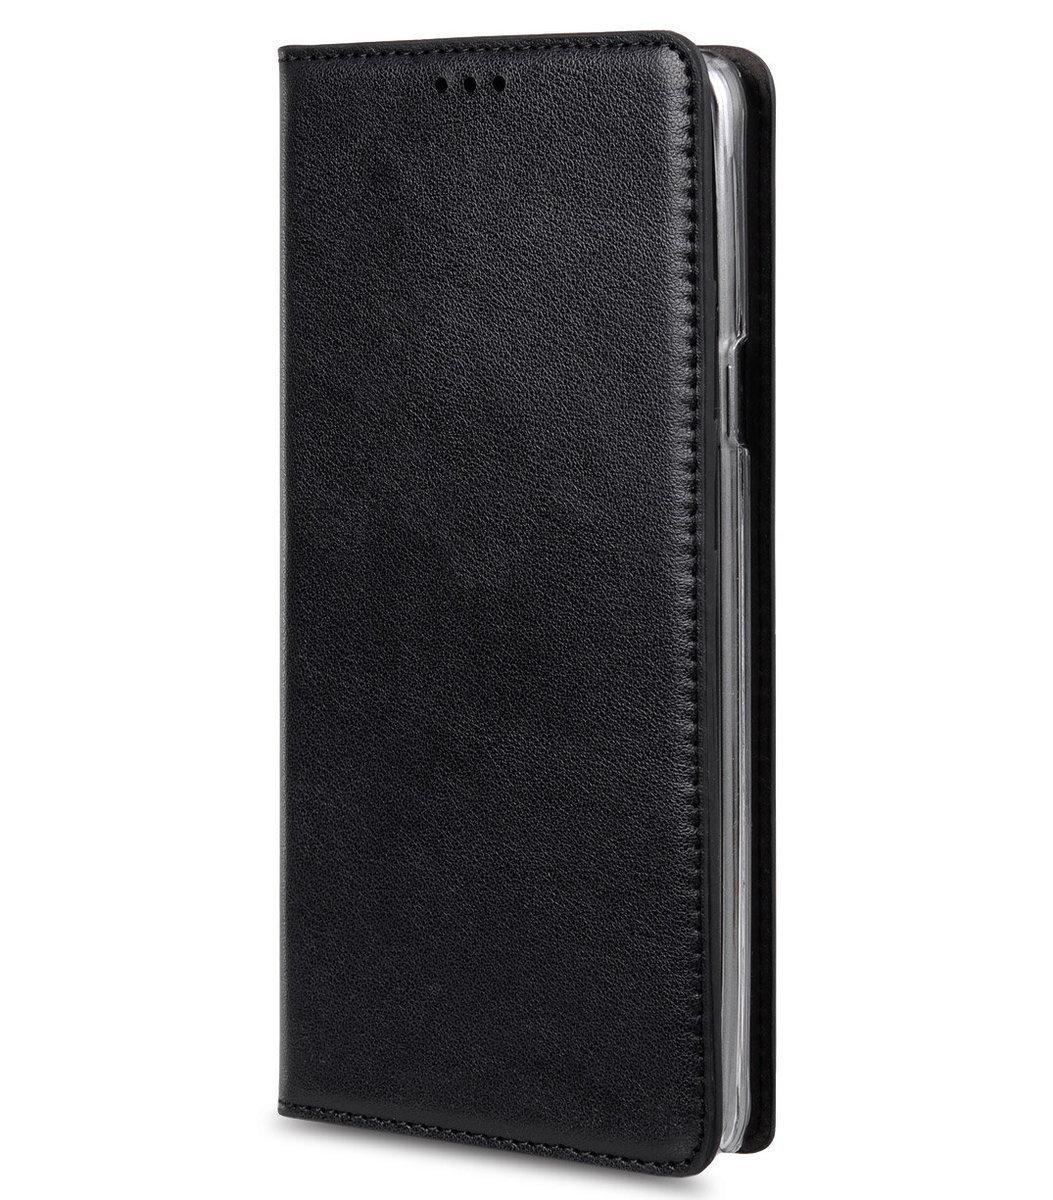 Samsung Galaxy Note 5 Herman 系列人造皮手機套 - 黑色